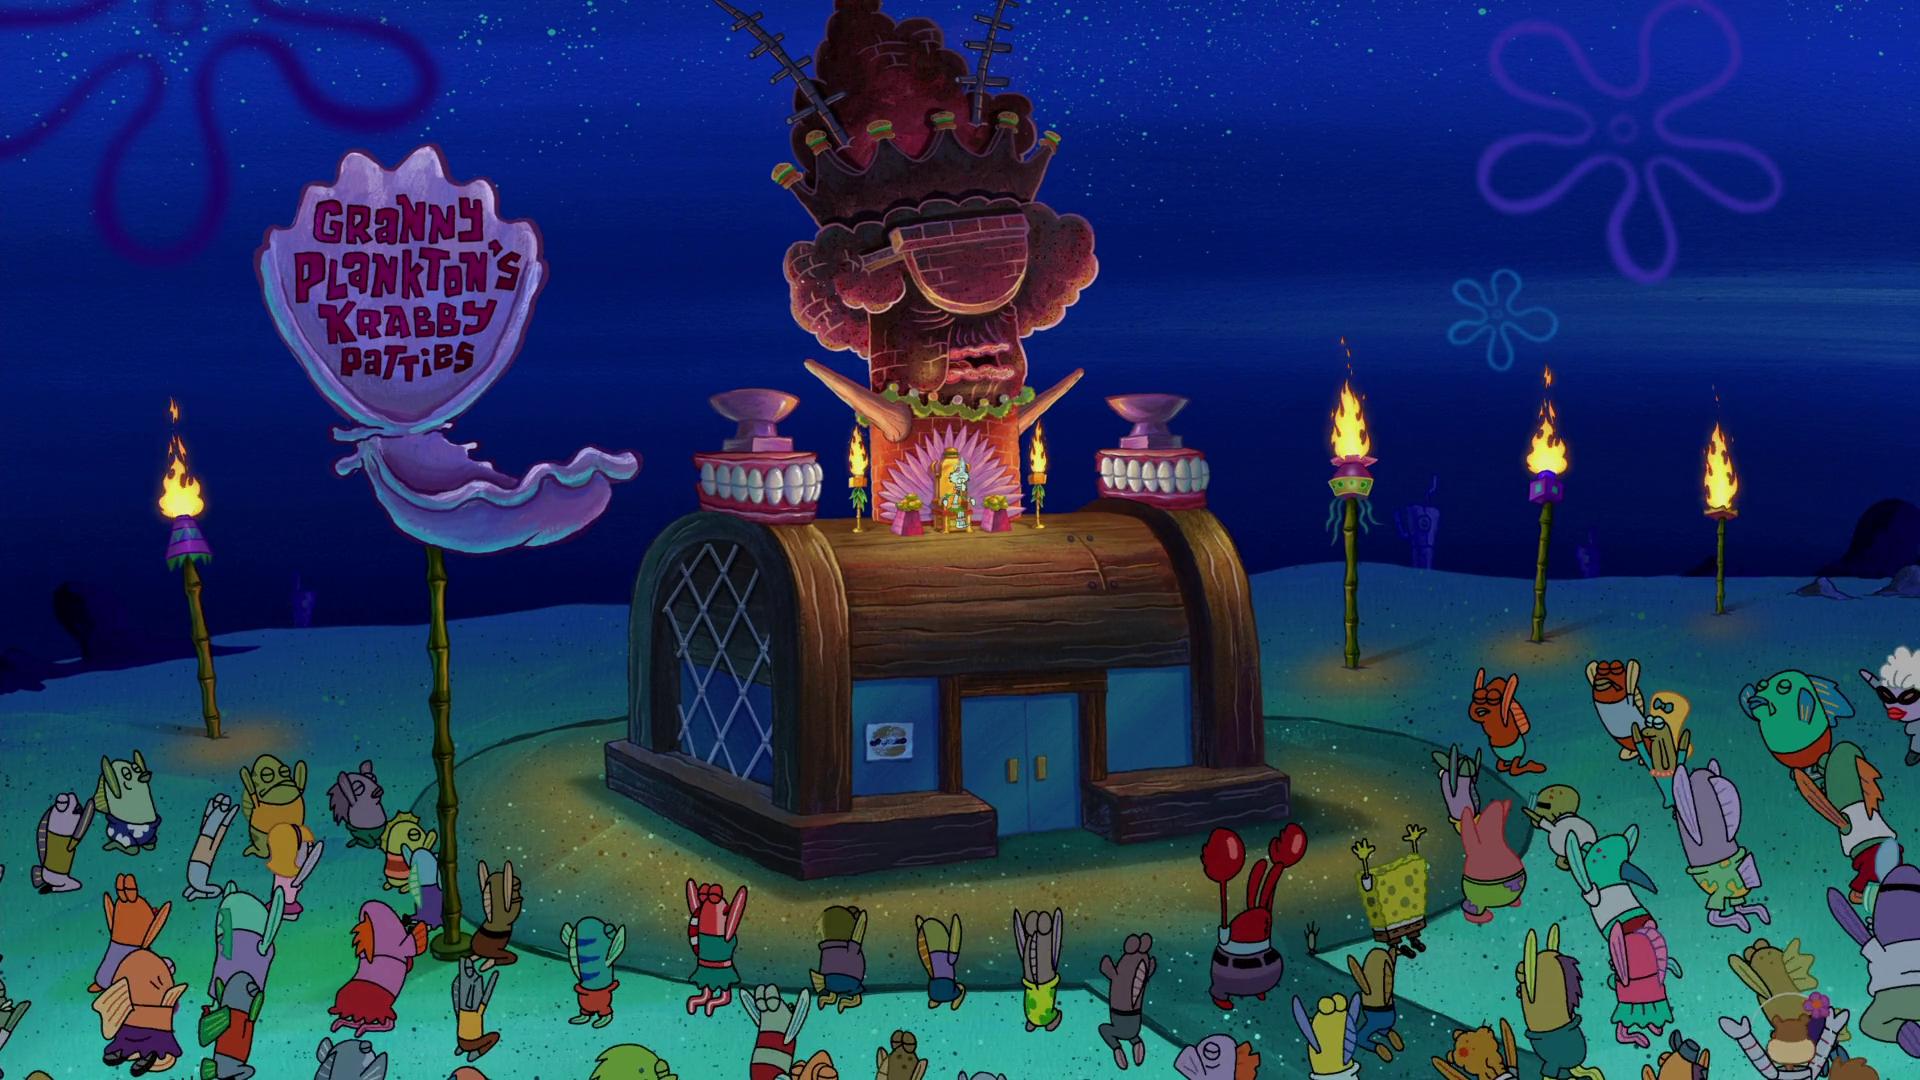 Granny Plankton's Krabby Patties